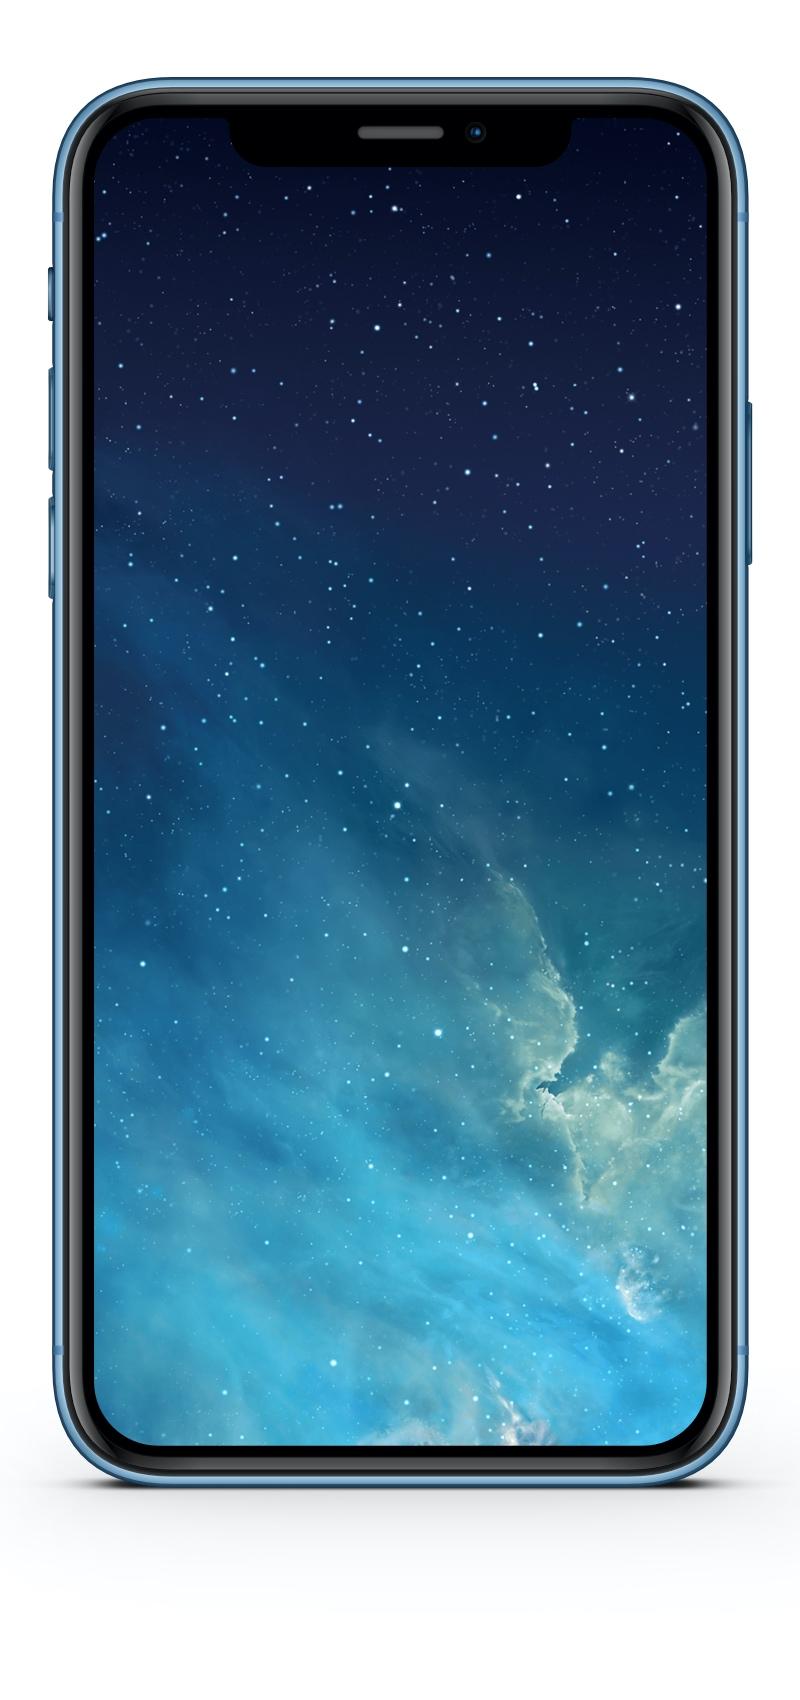 "Hintergrundbild (Wallpaper) ""iPhone 5"" (iOS 7) optimiert für iPhone XR"